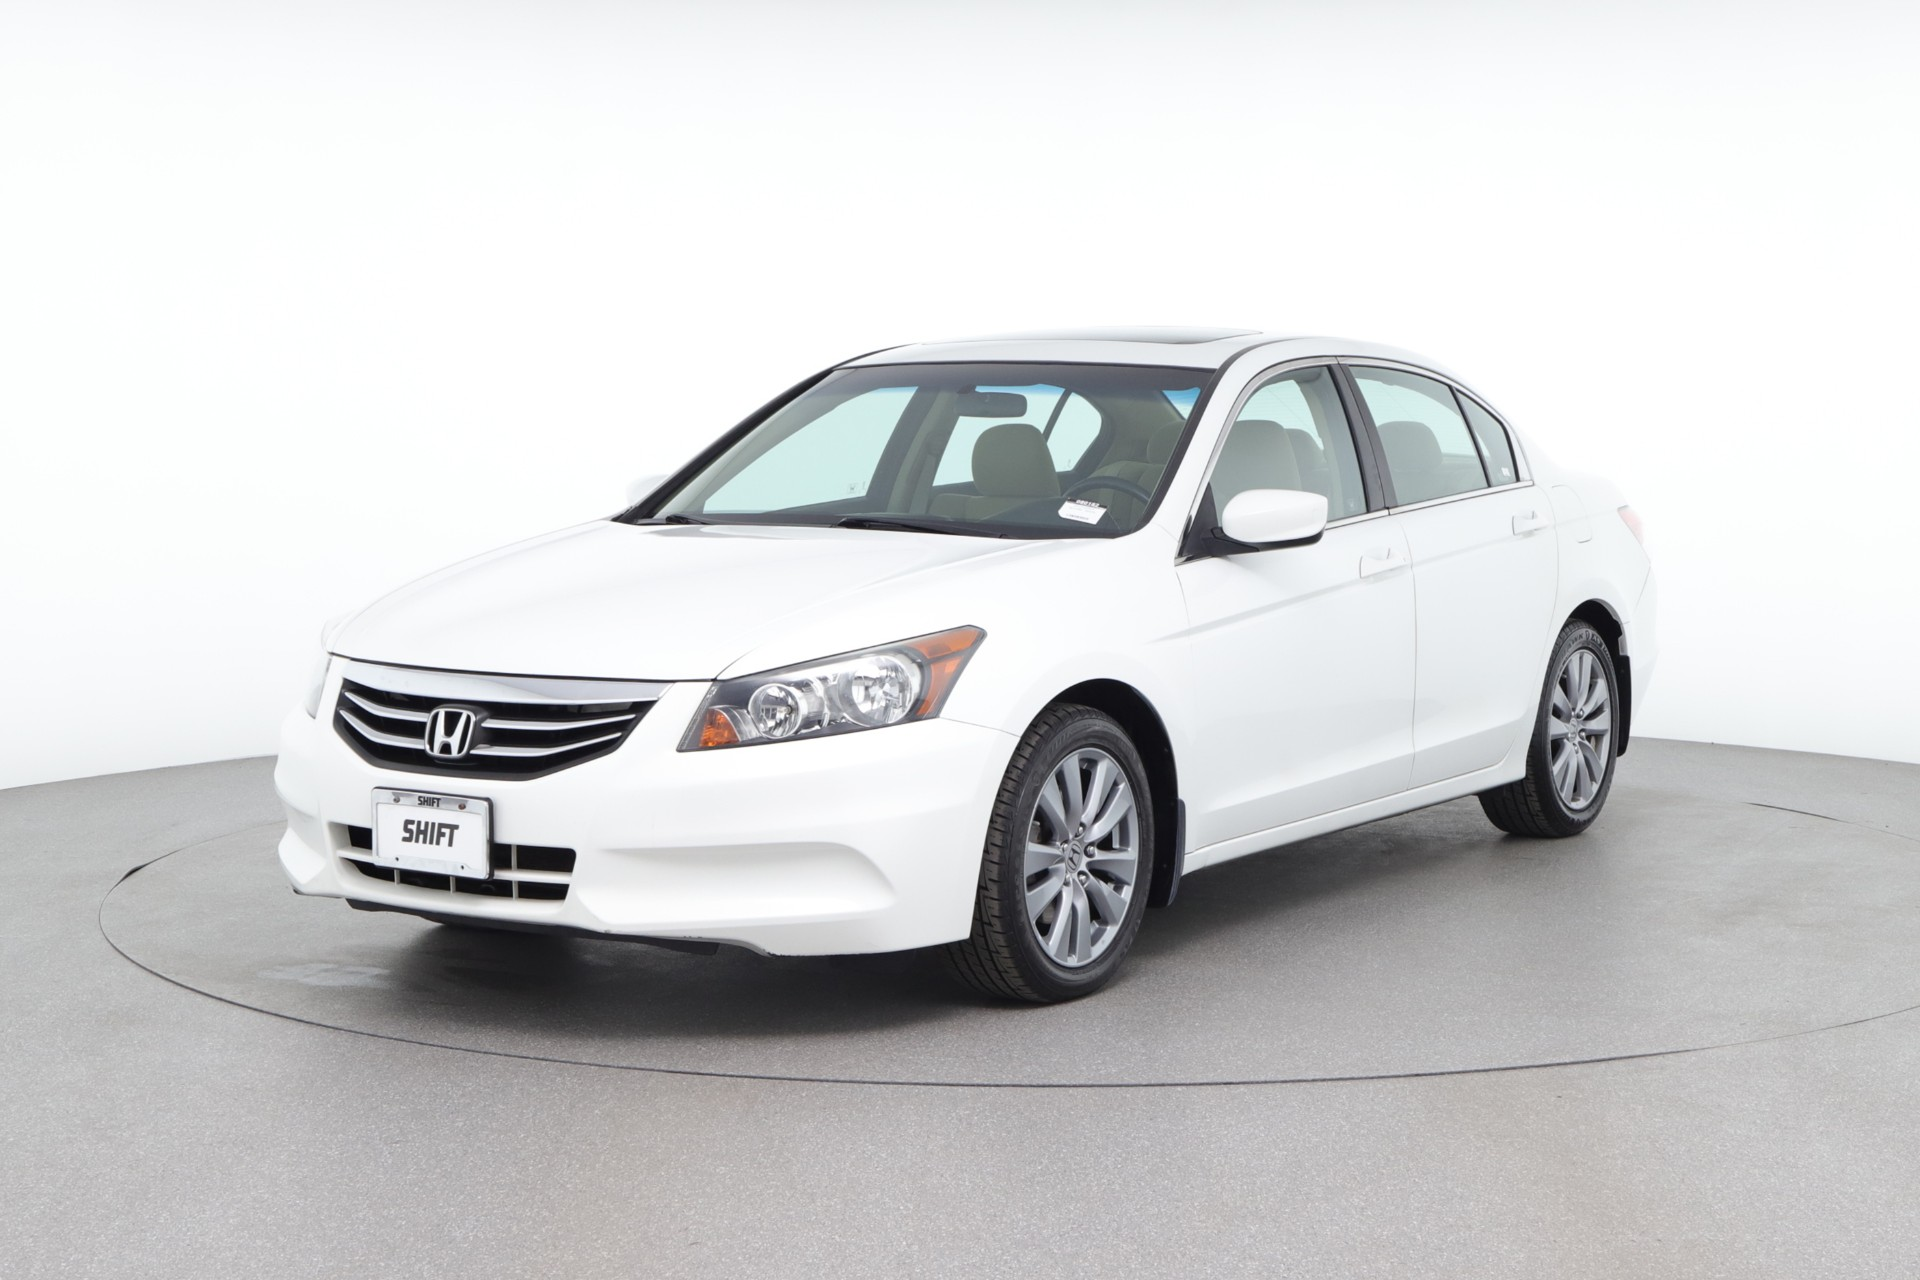 2012 Honda Accord EX (from $14,200)